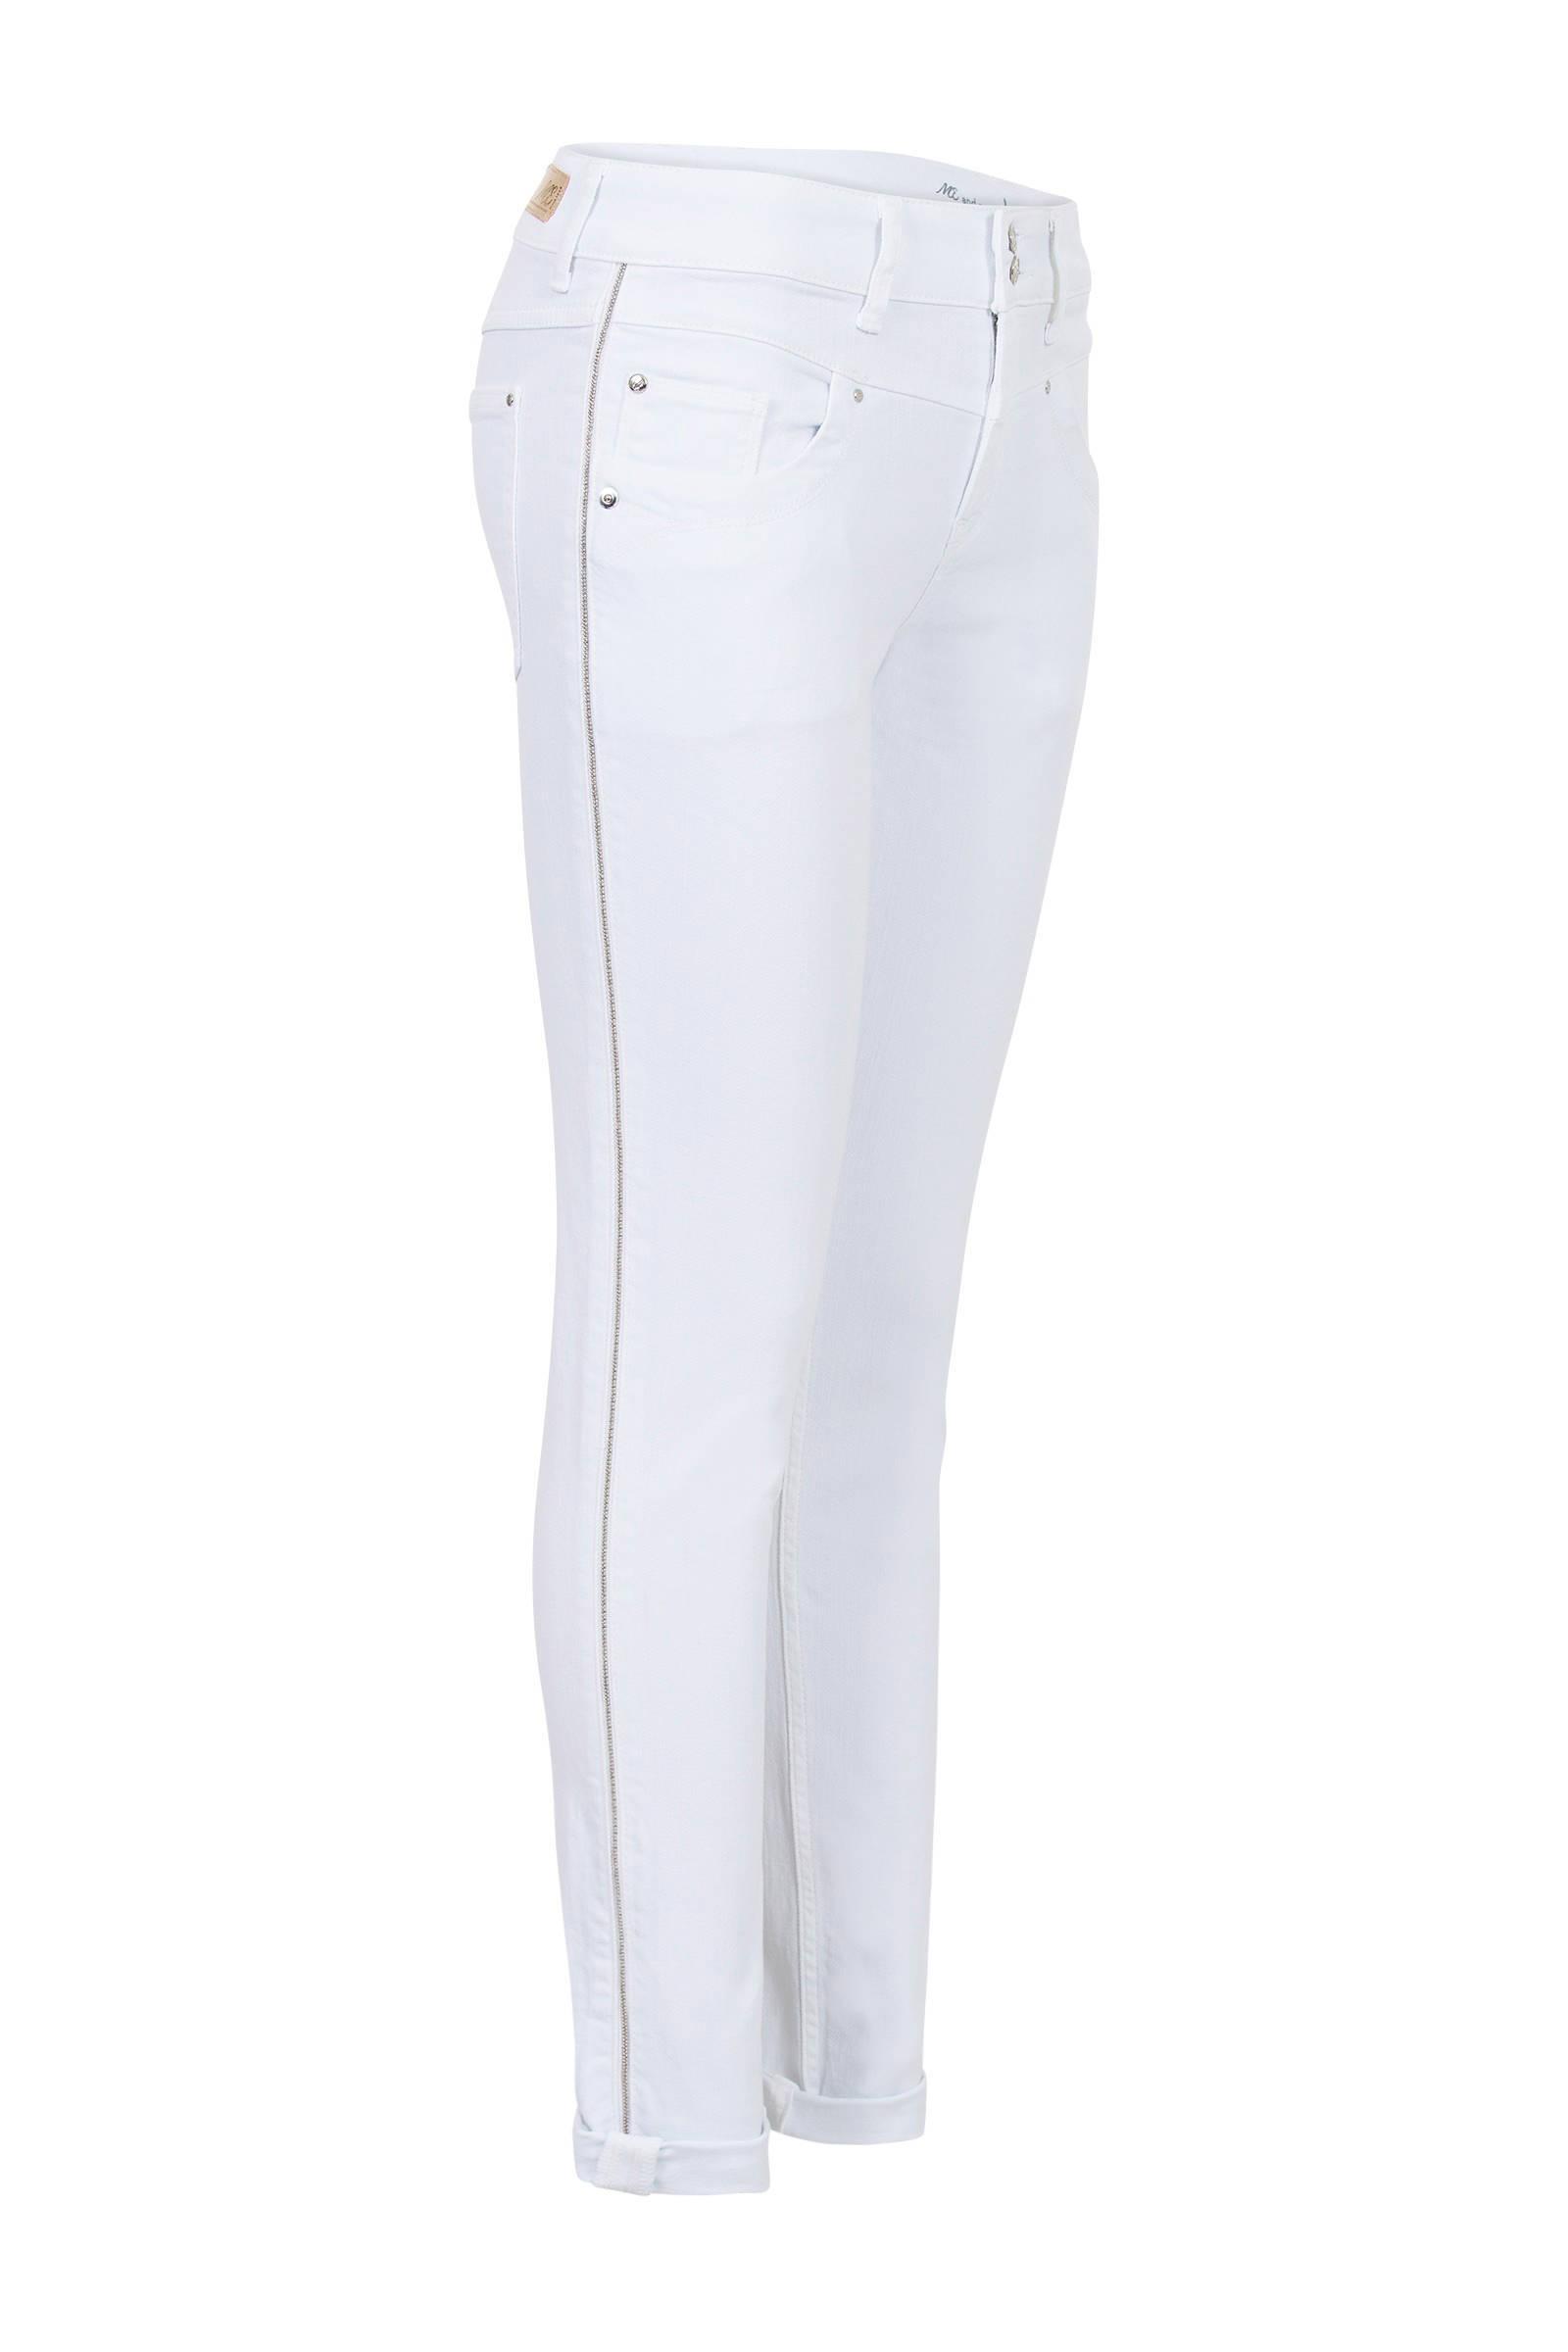 wehkamp witte broek